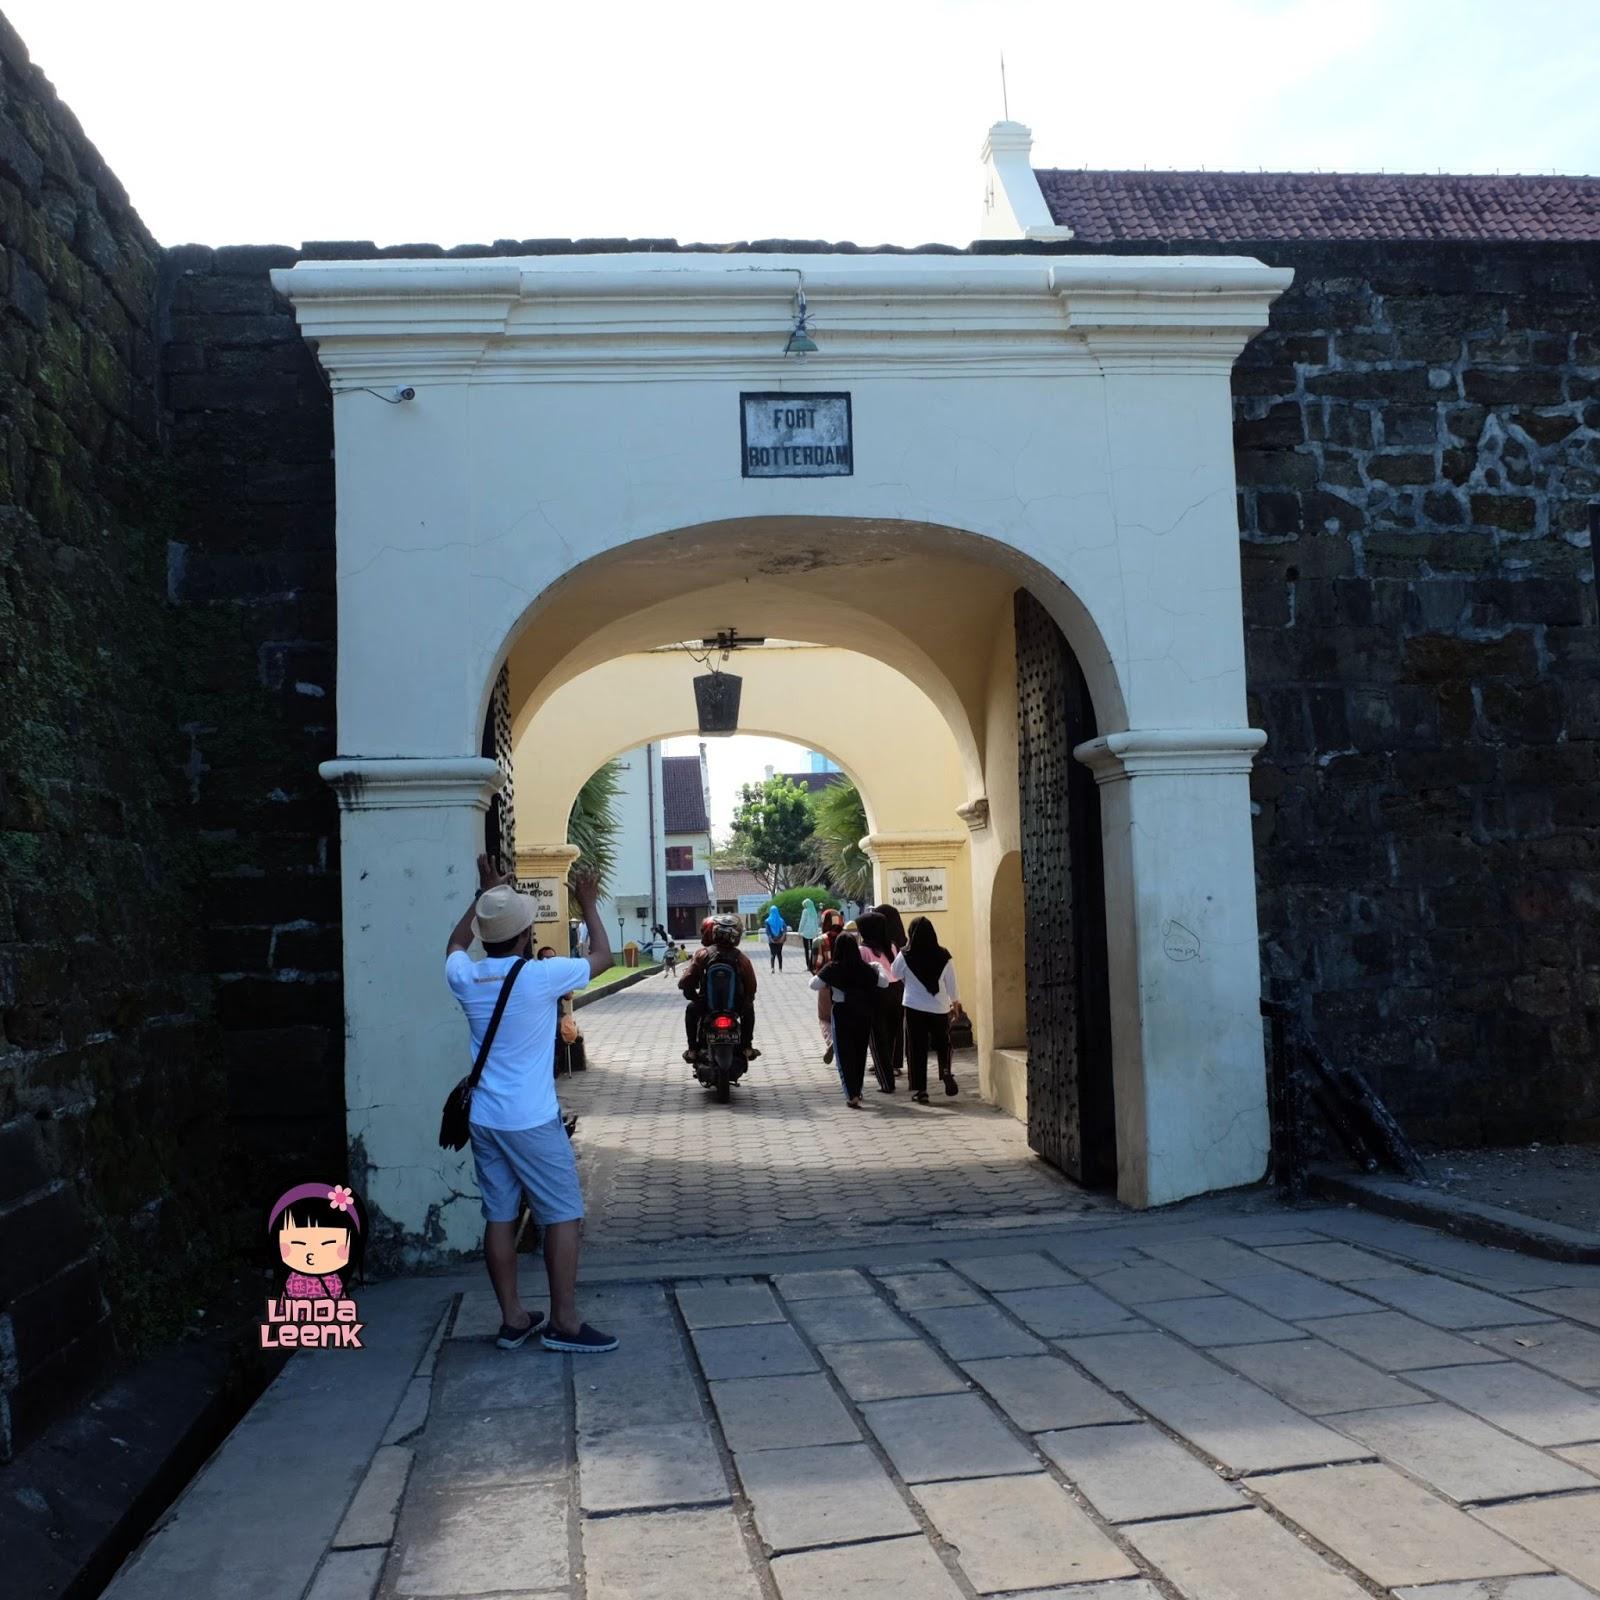 Lingtrip Wisata Sejarah Benteng Fort Rotterdam Makassar Sebenarnya Transportasi Umum